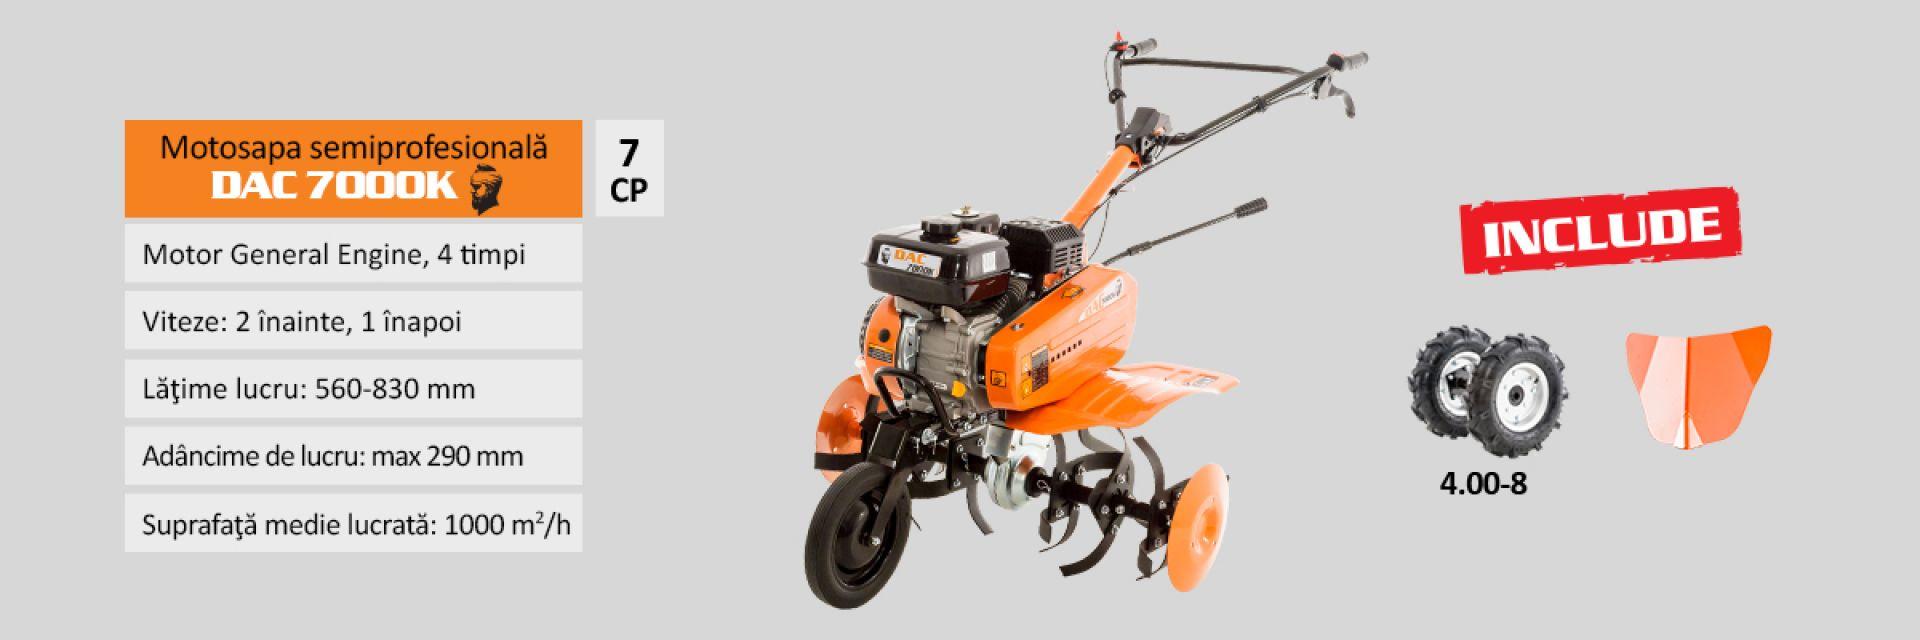 Motosapa DAC 7000K